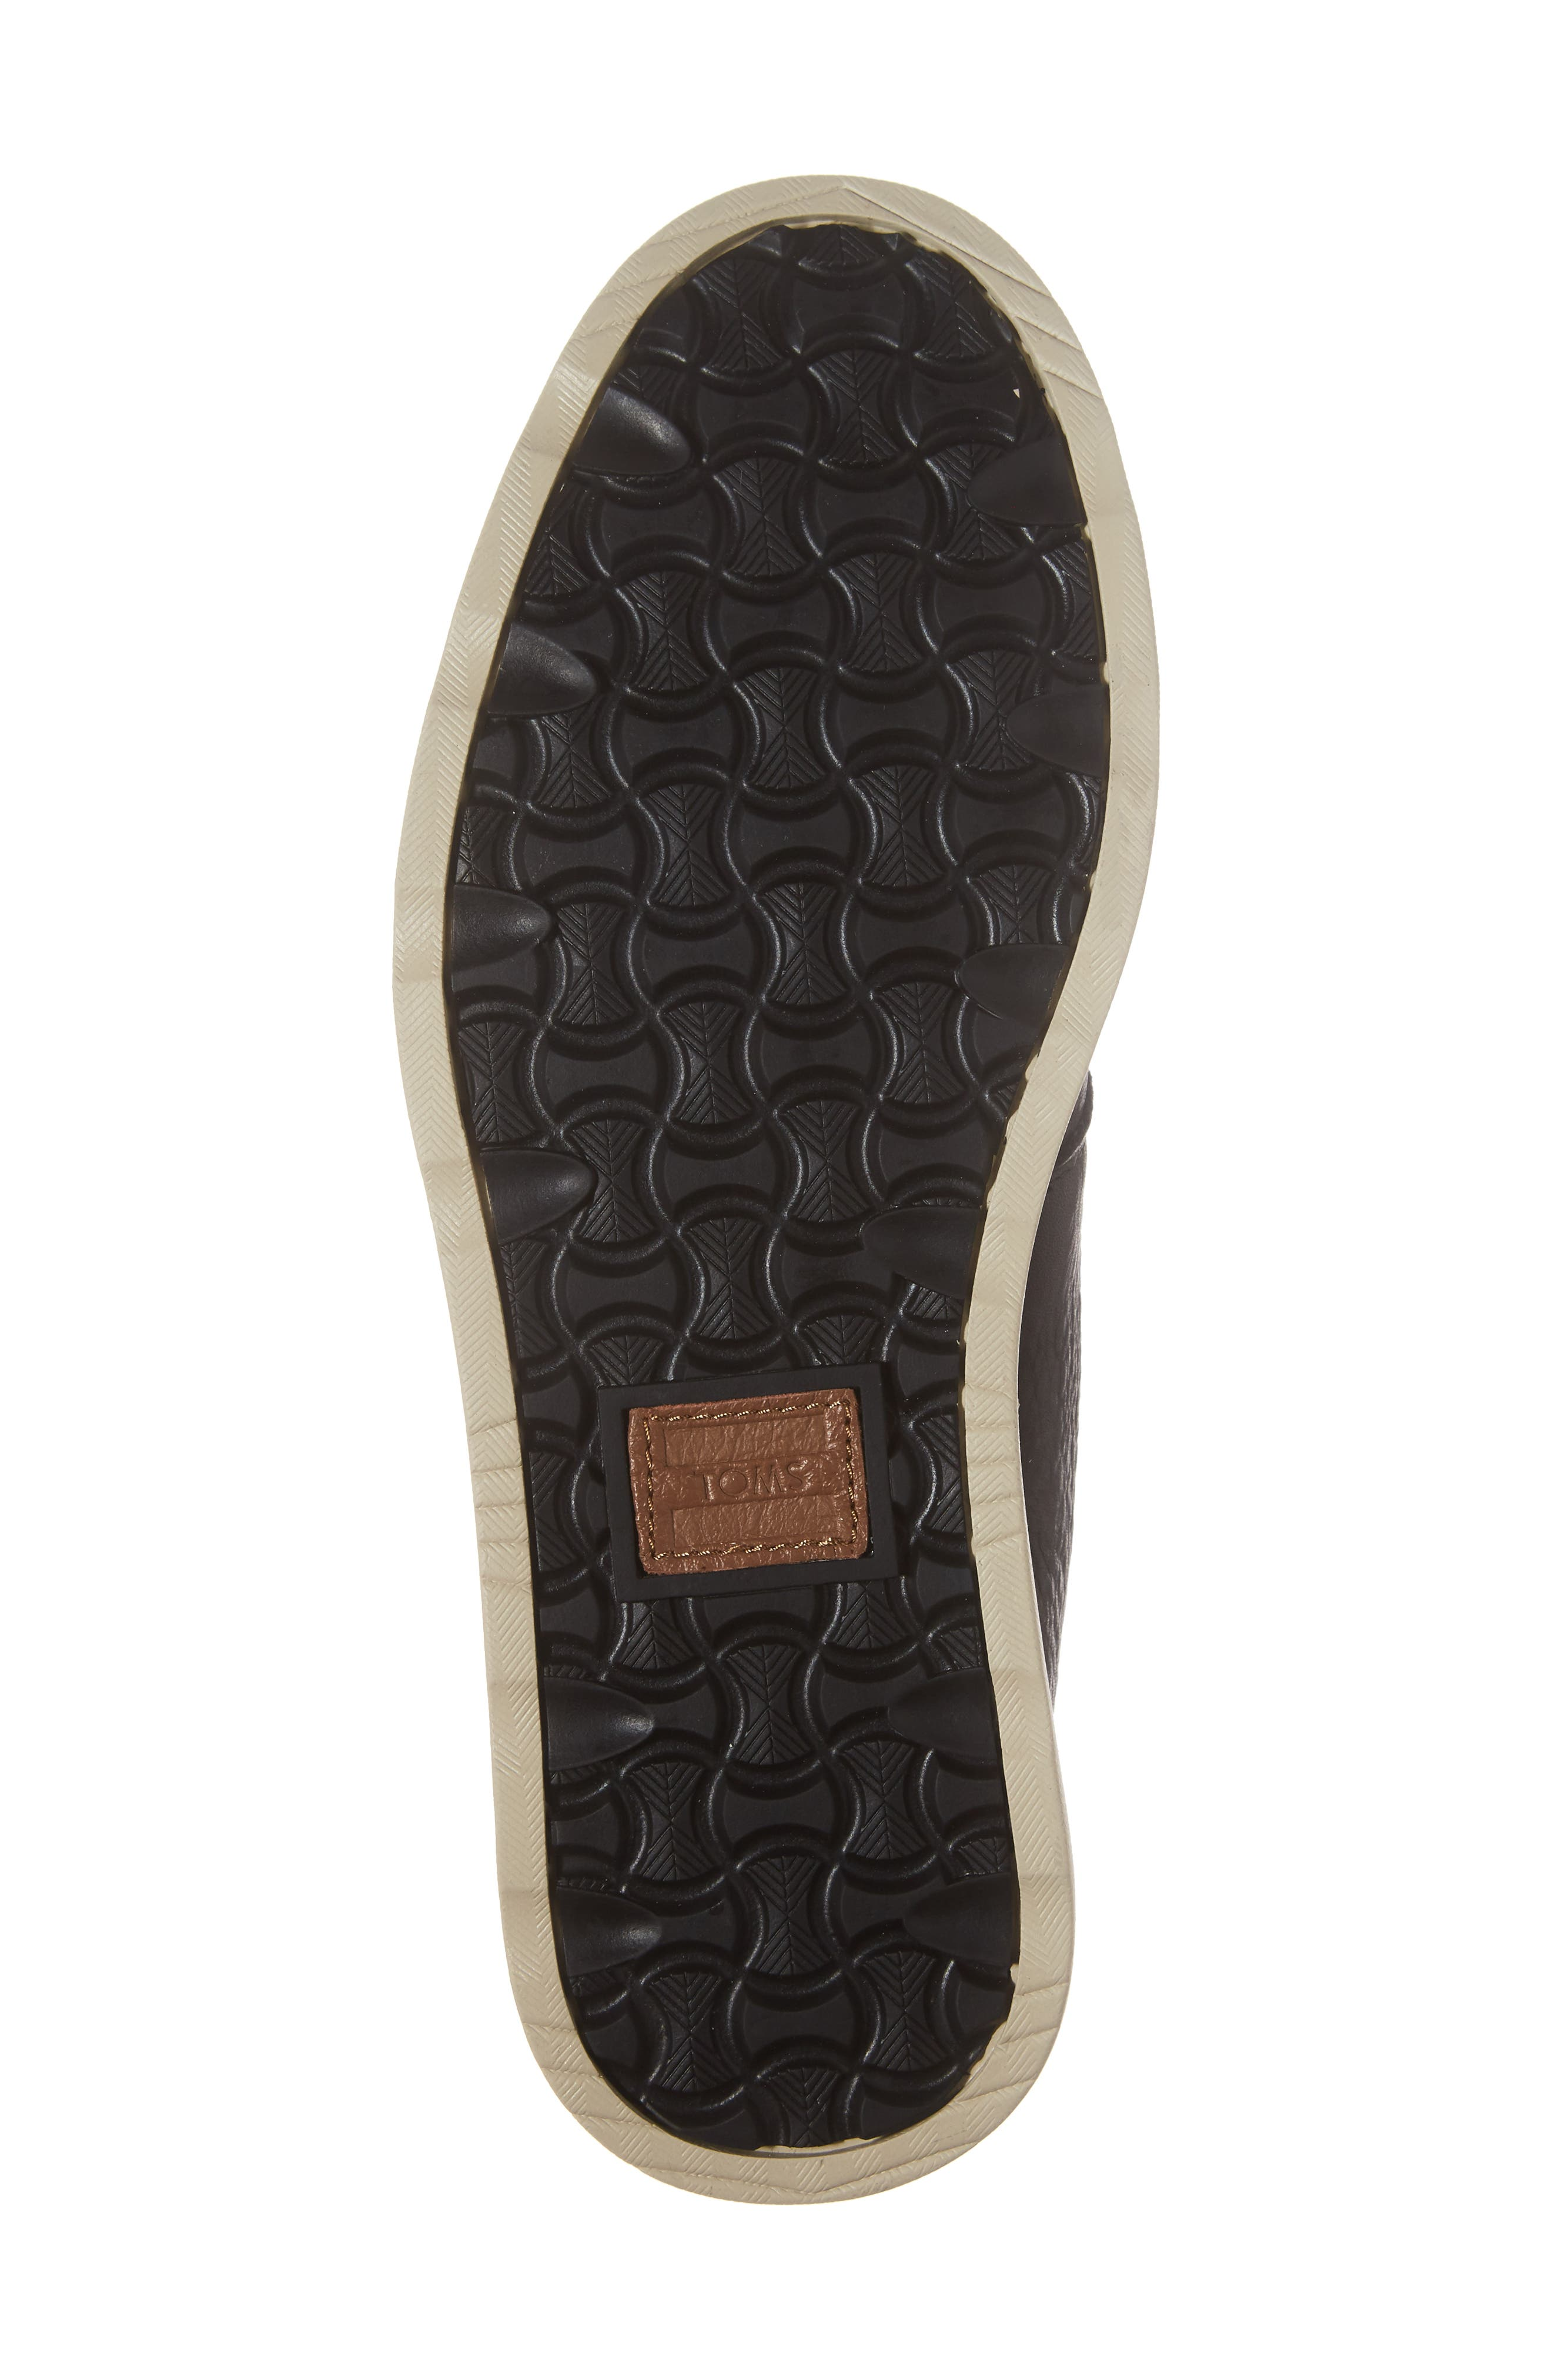 Chukka Boot,                             Alternate thumbnail 6, color,                             Black/Black Leather